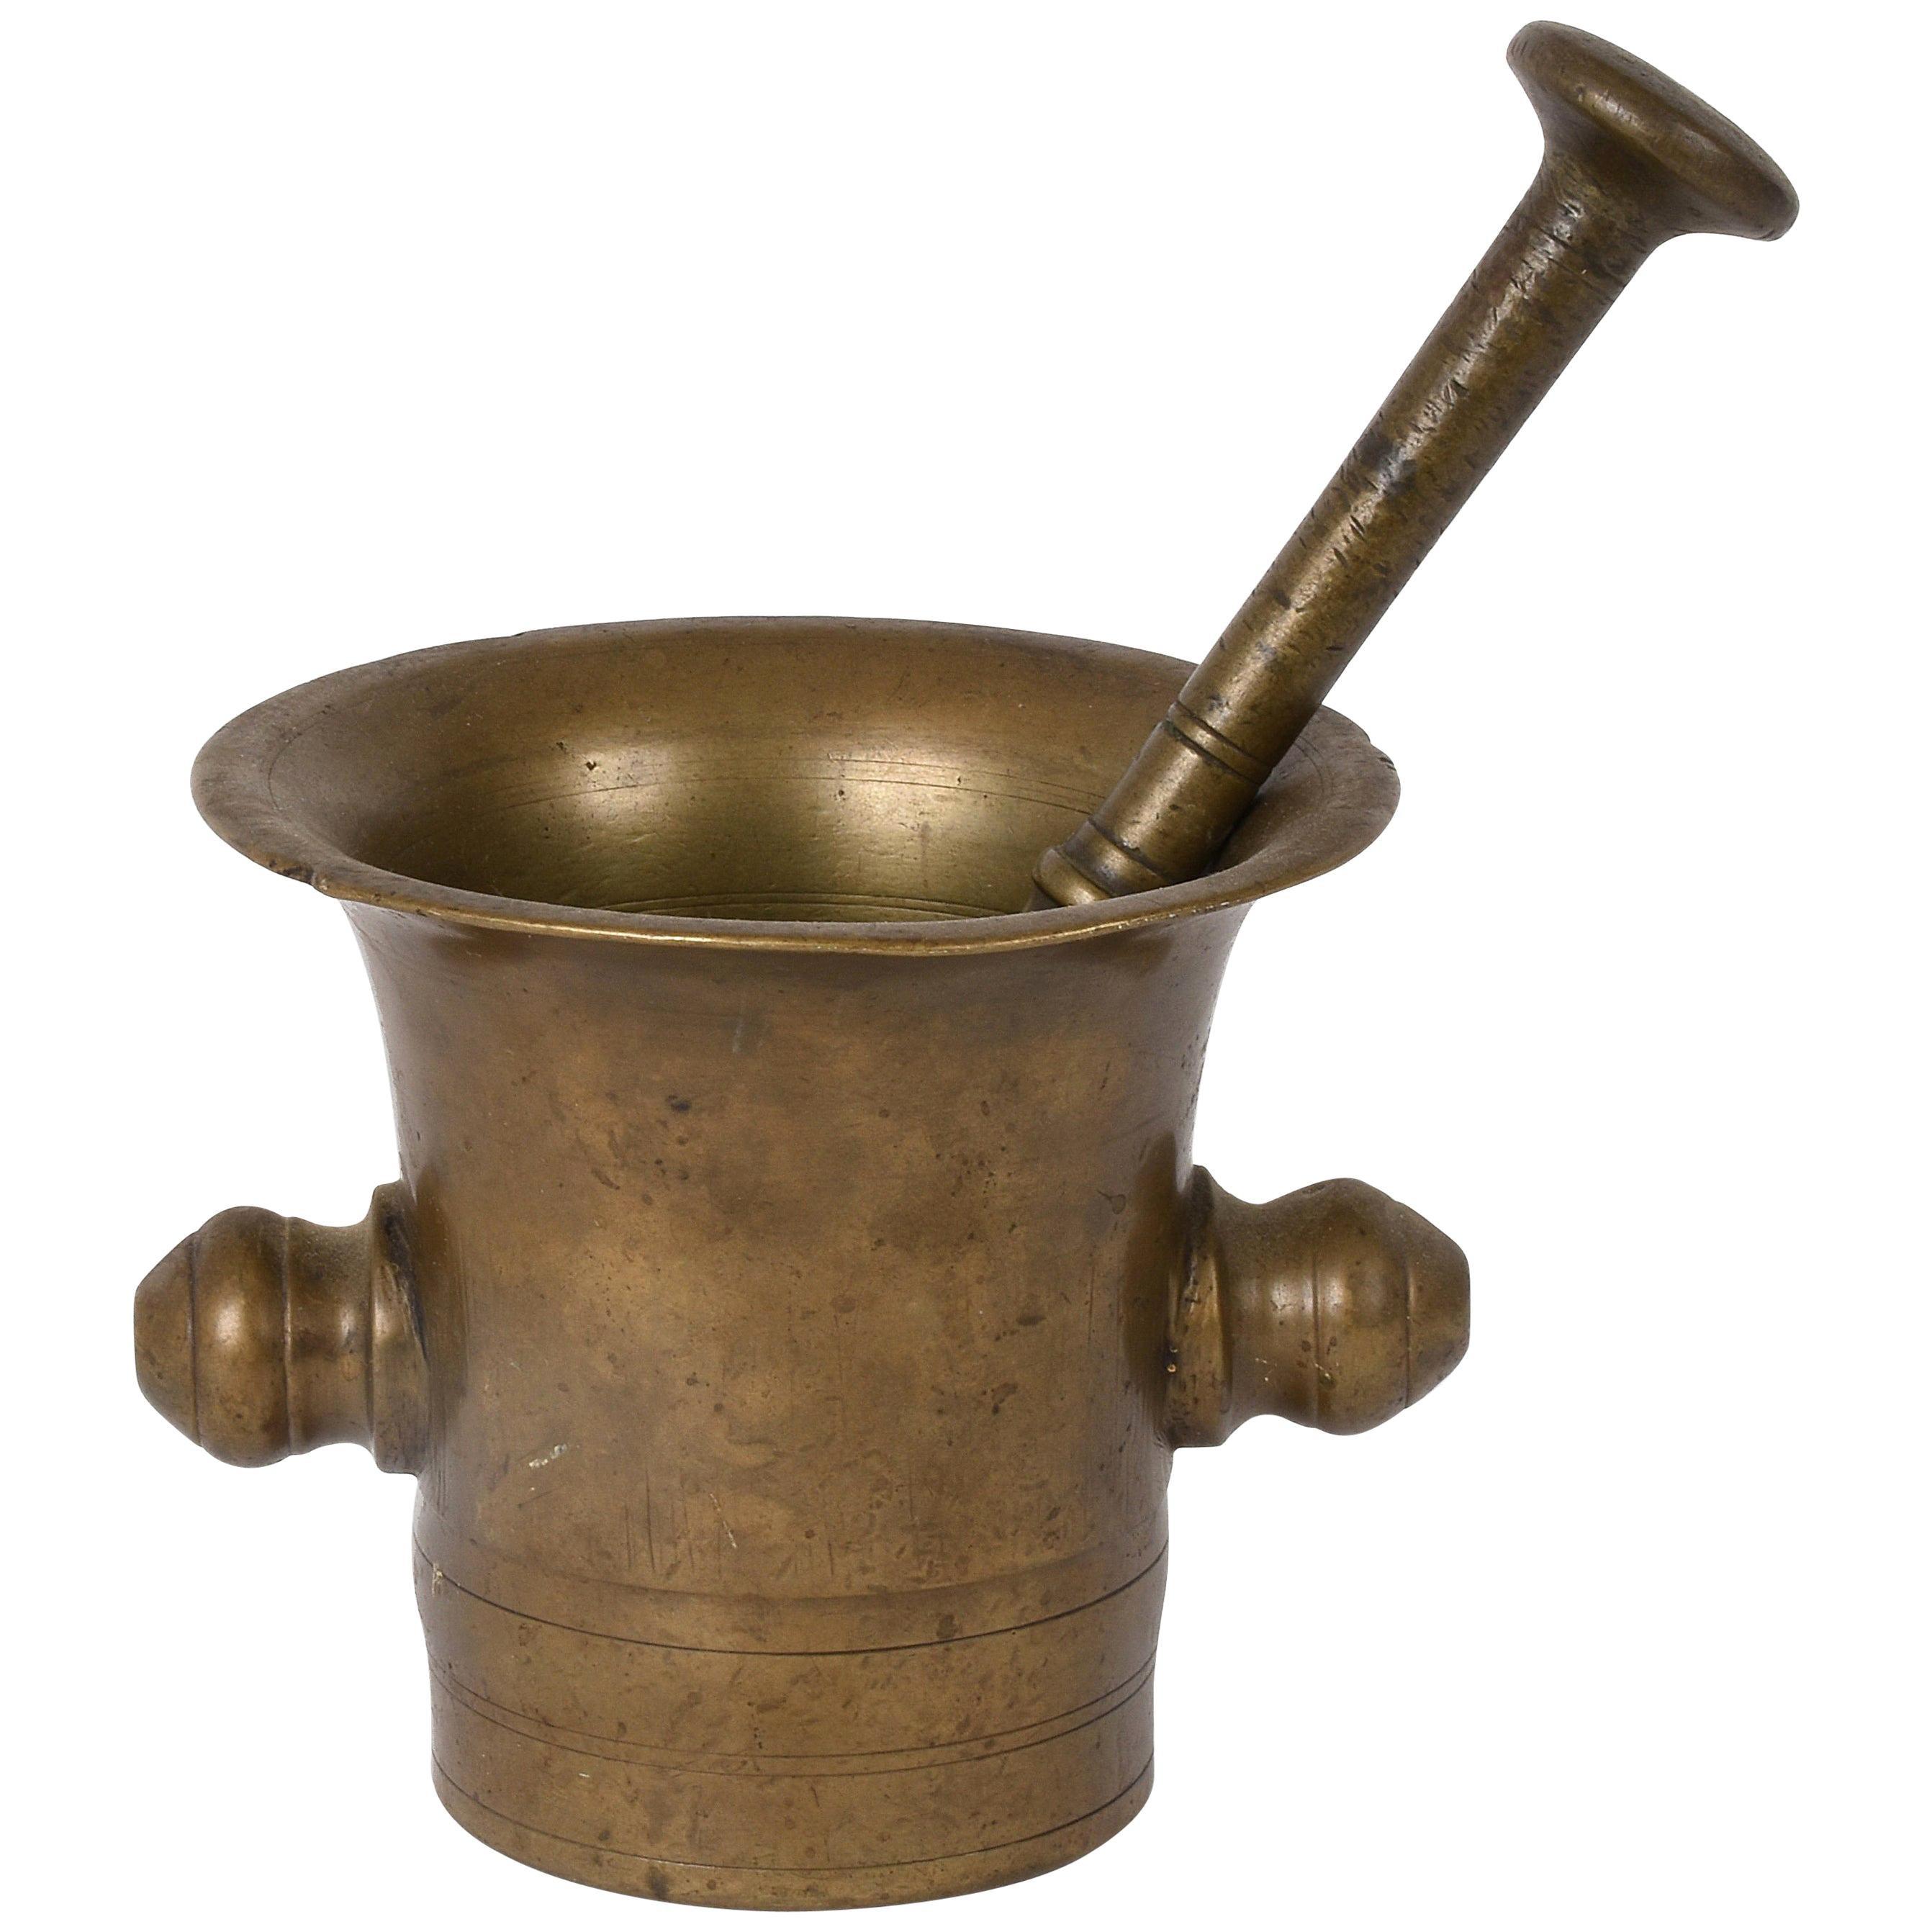 Grand Tour 19th Century Handmade Bronze Pharmaceutic Mortar with Pestle